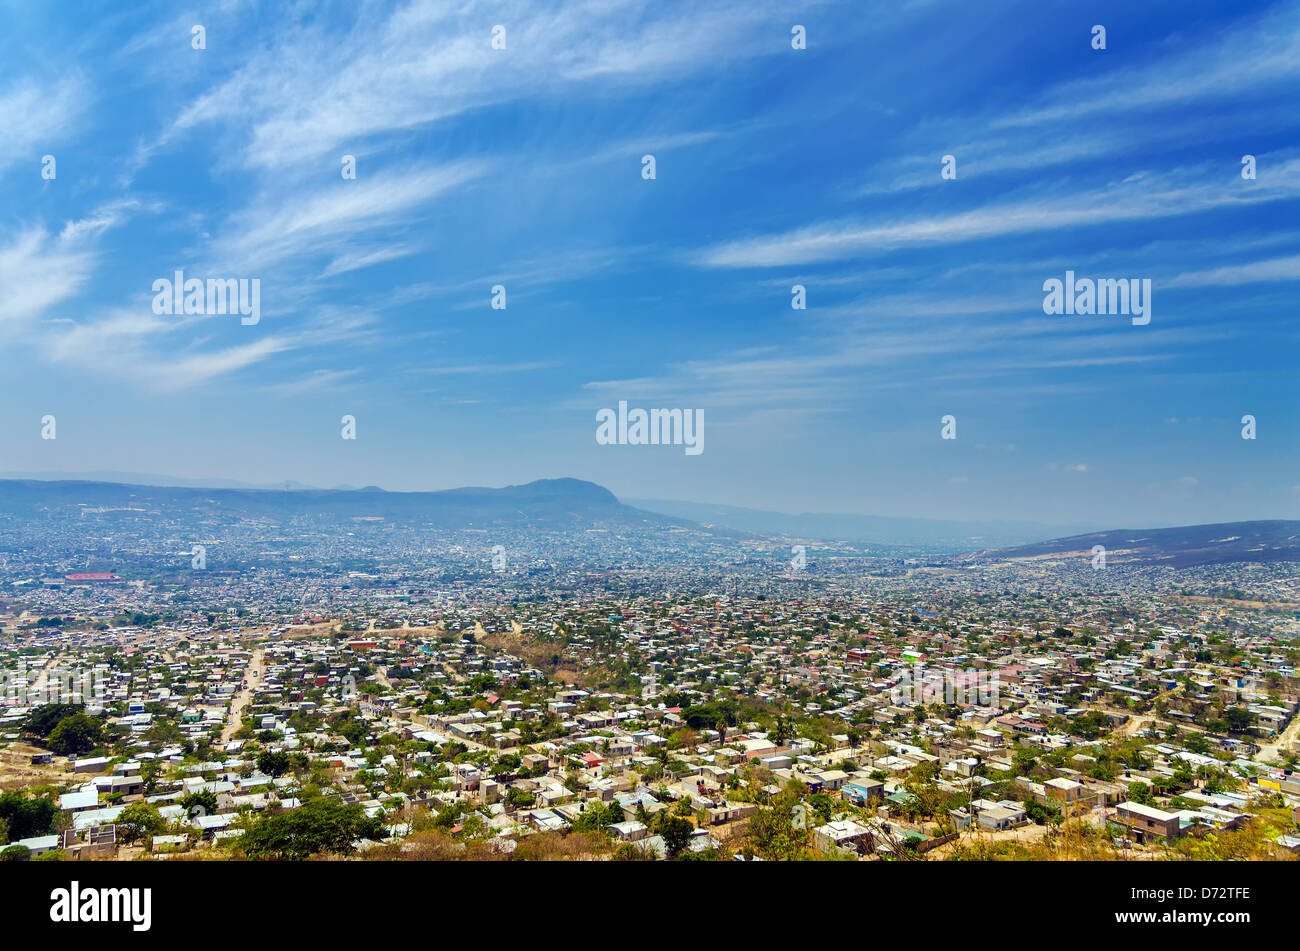 A view of Tuxtla Gutierrez, the capital of Chiapas, Mexico - Stock Image